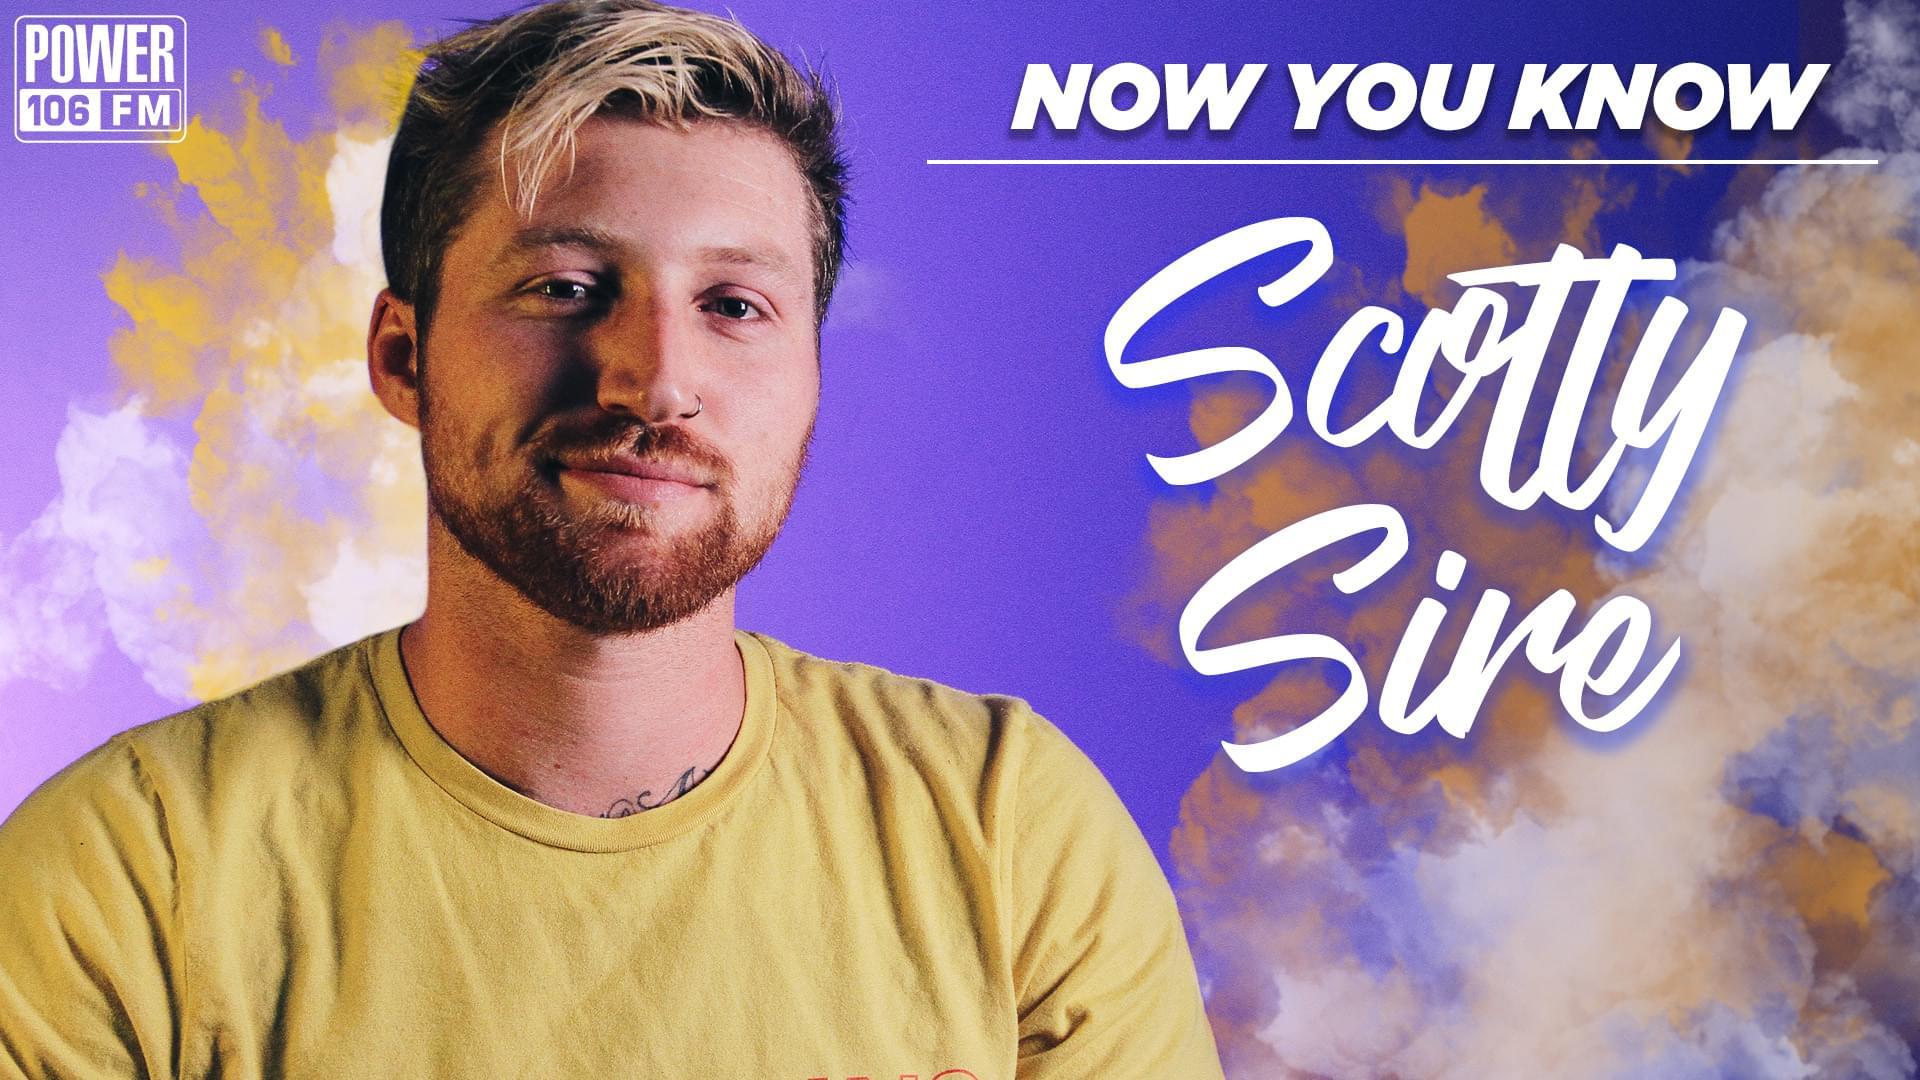 scotty-cover-2.jpg